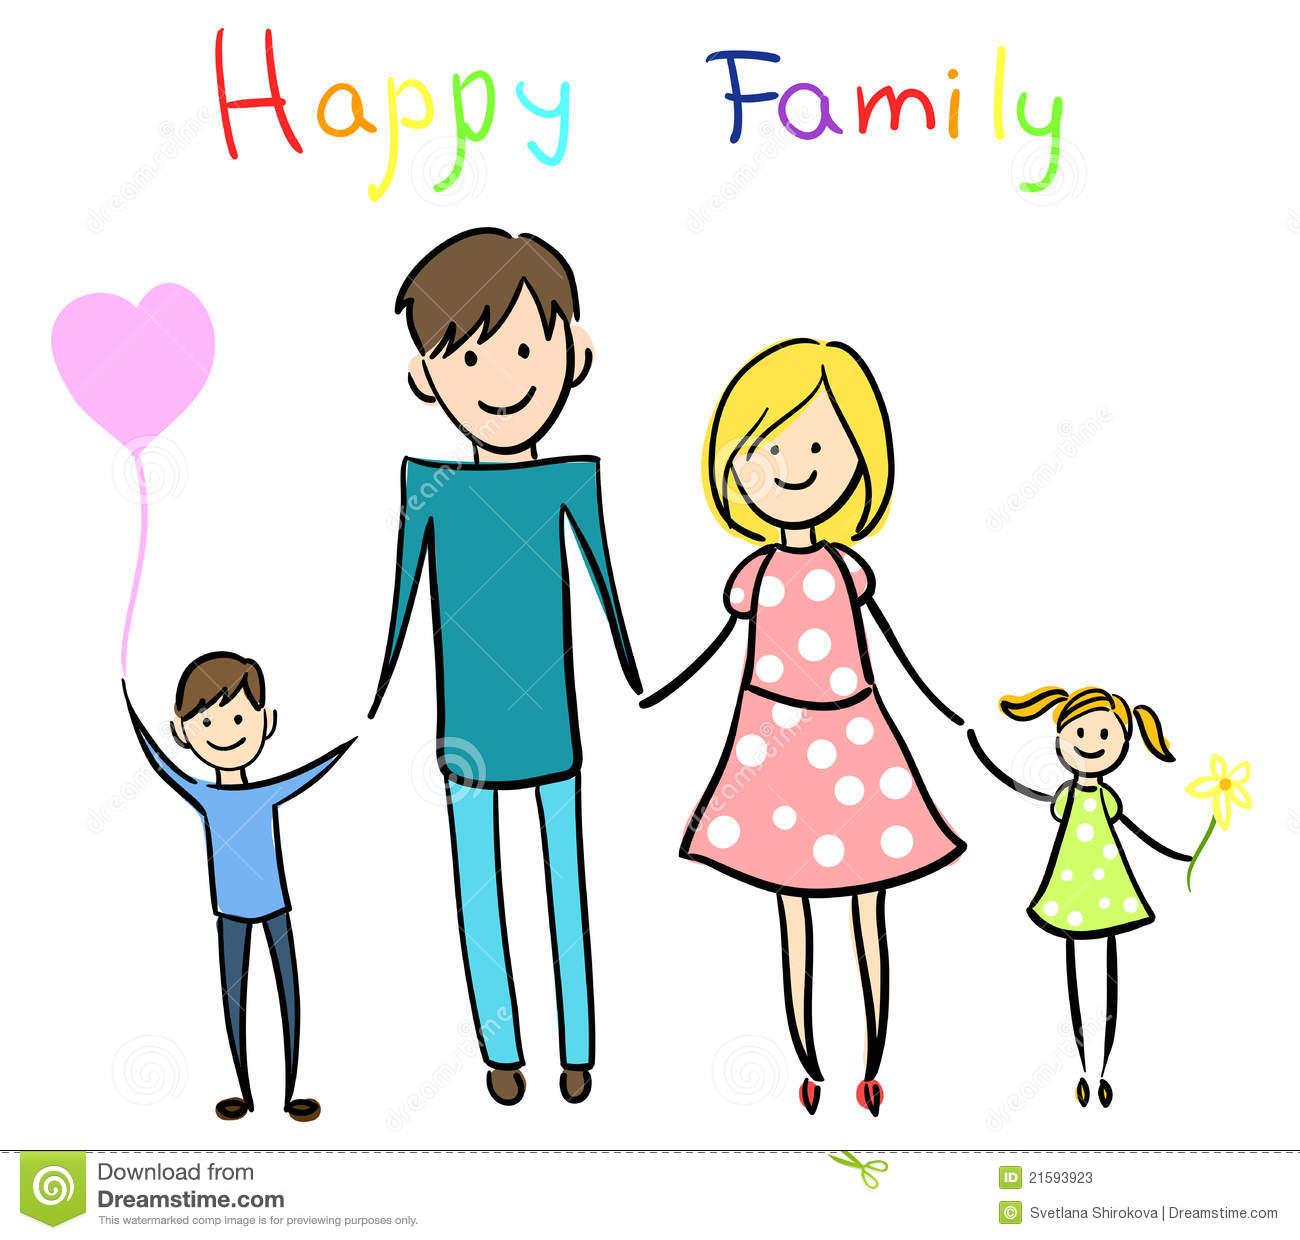 Happy Family Clipart & Happy Family Clip Art Images.